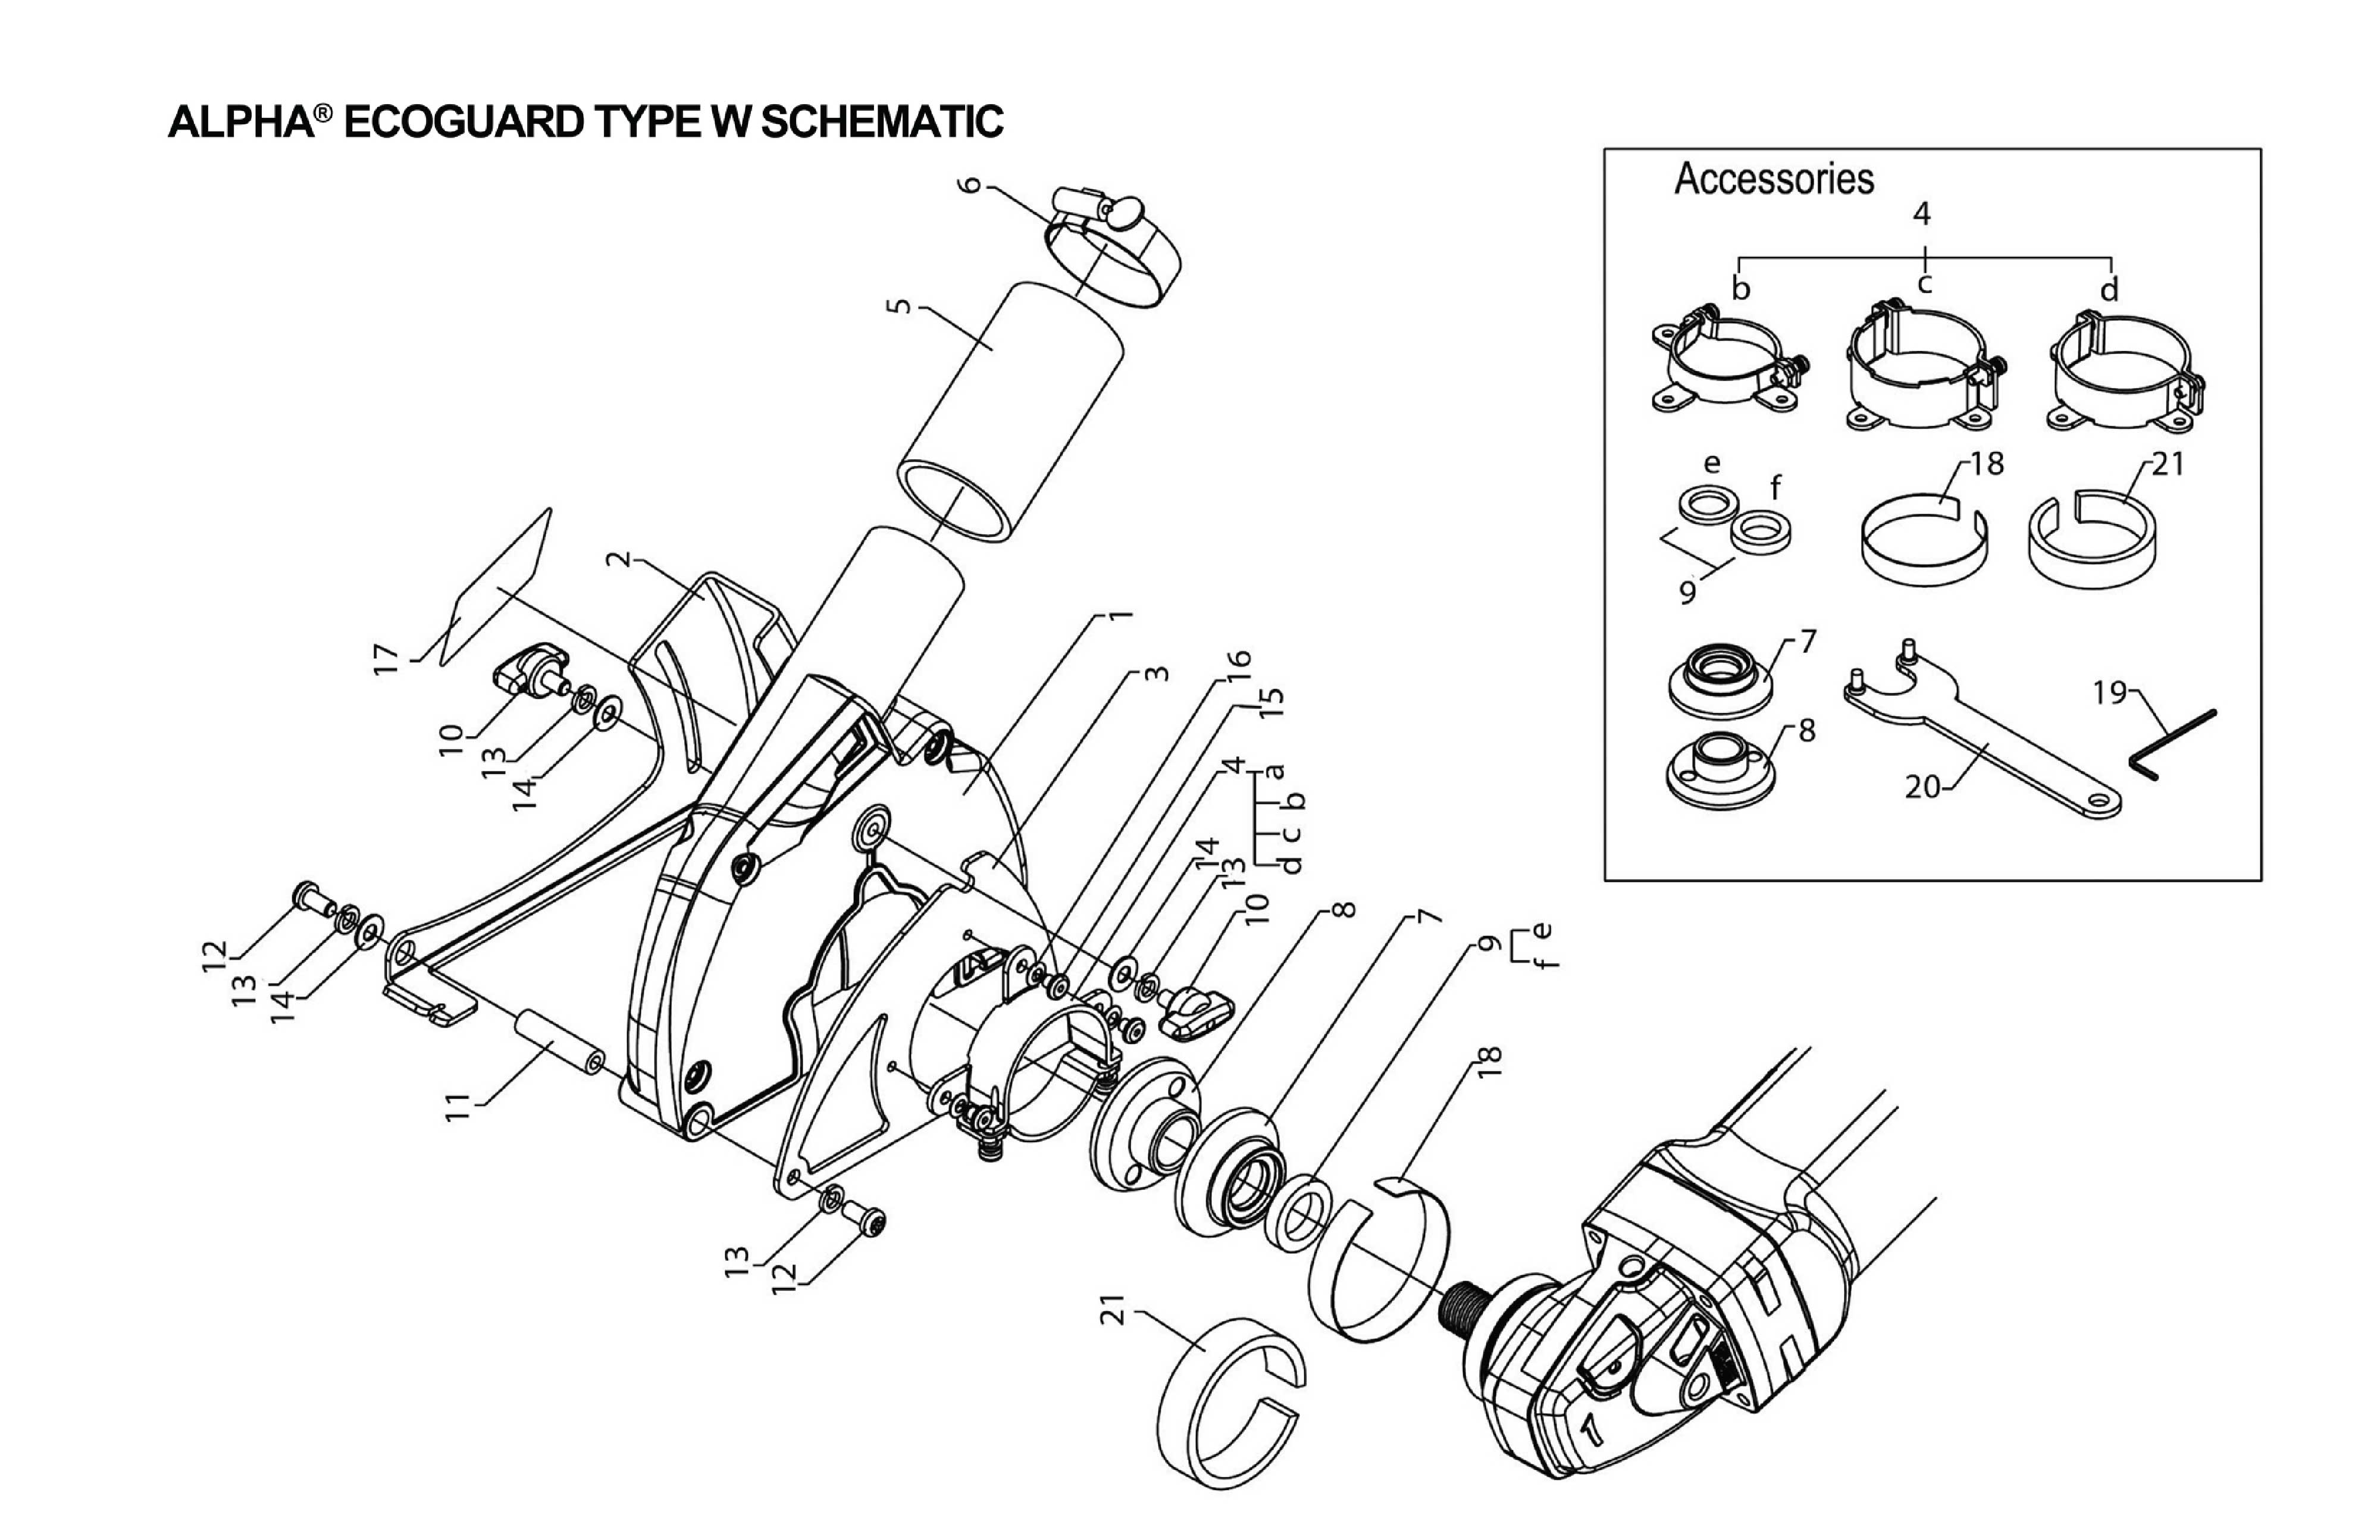 Alpha Professional Tools® :: Ecoguard W Spare Parts